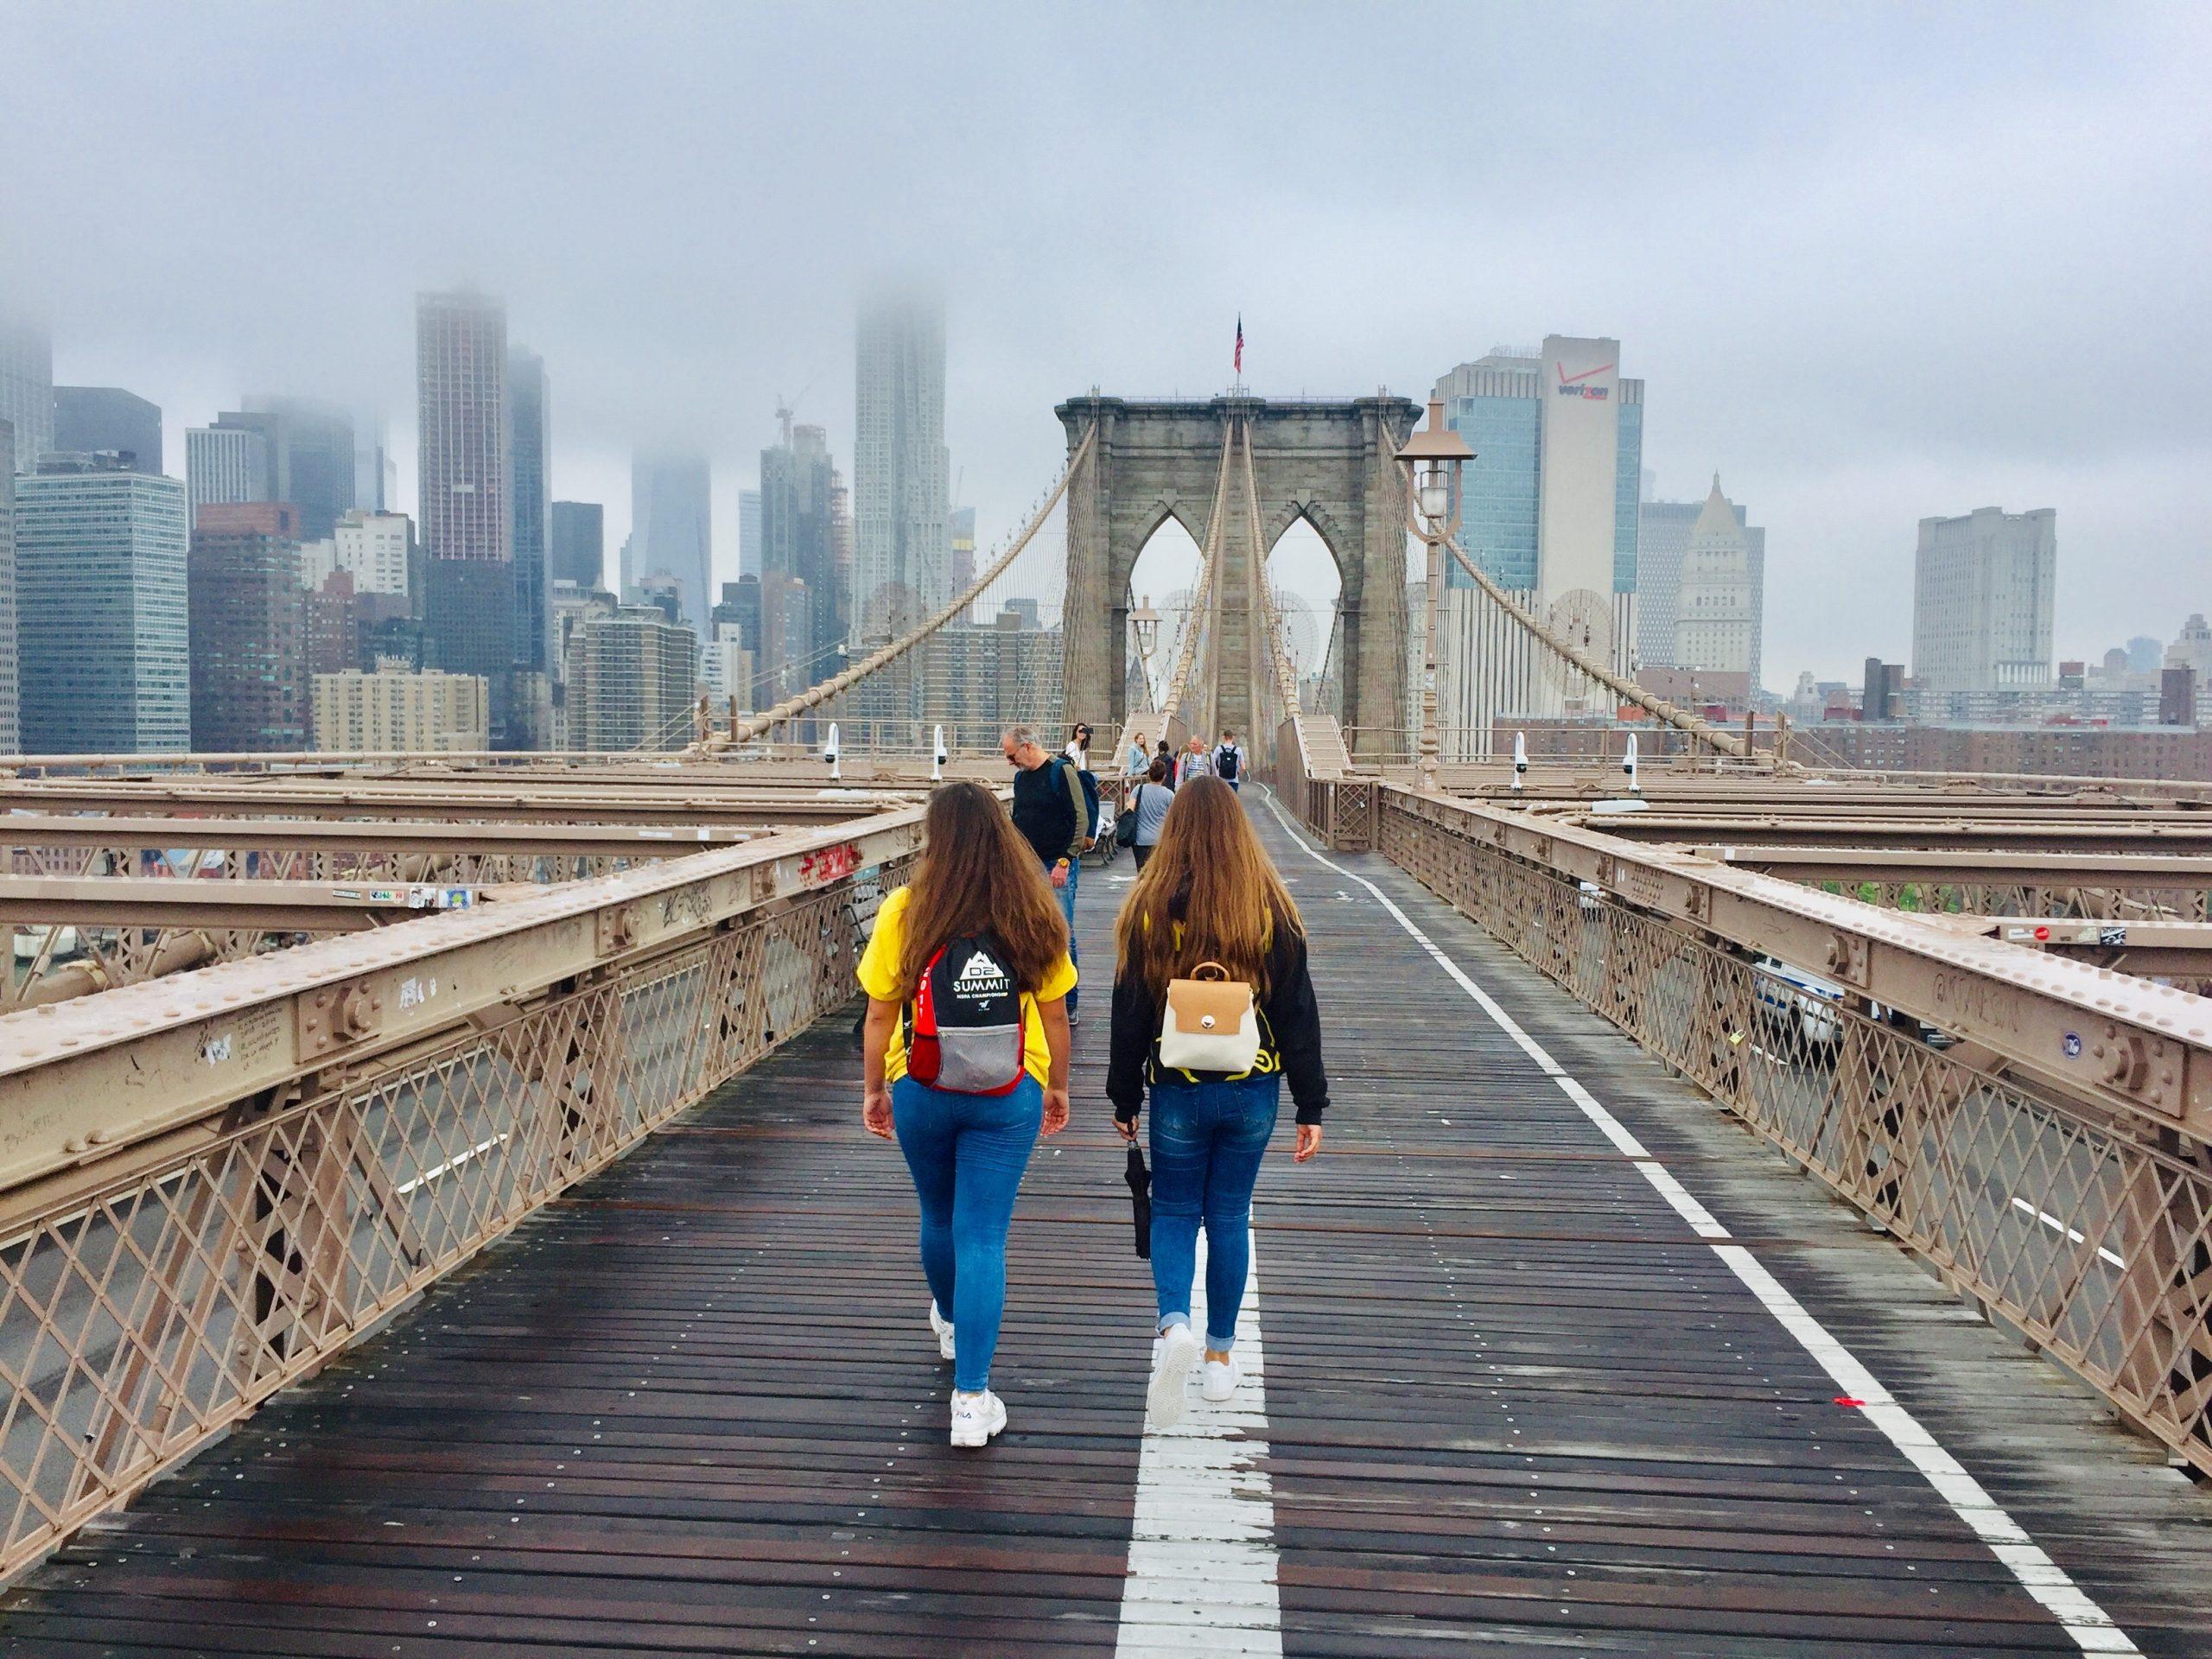 Two girls walk across the Brooklyn Bridge on an early foggy morning.